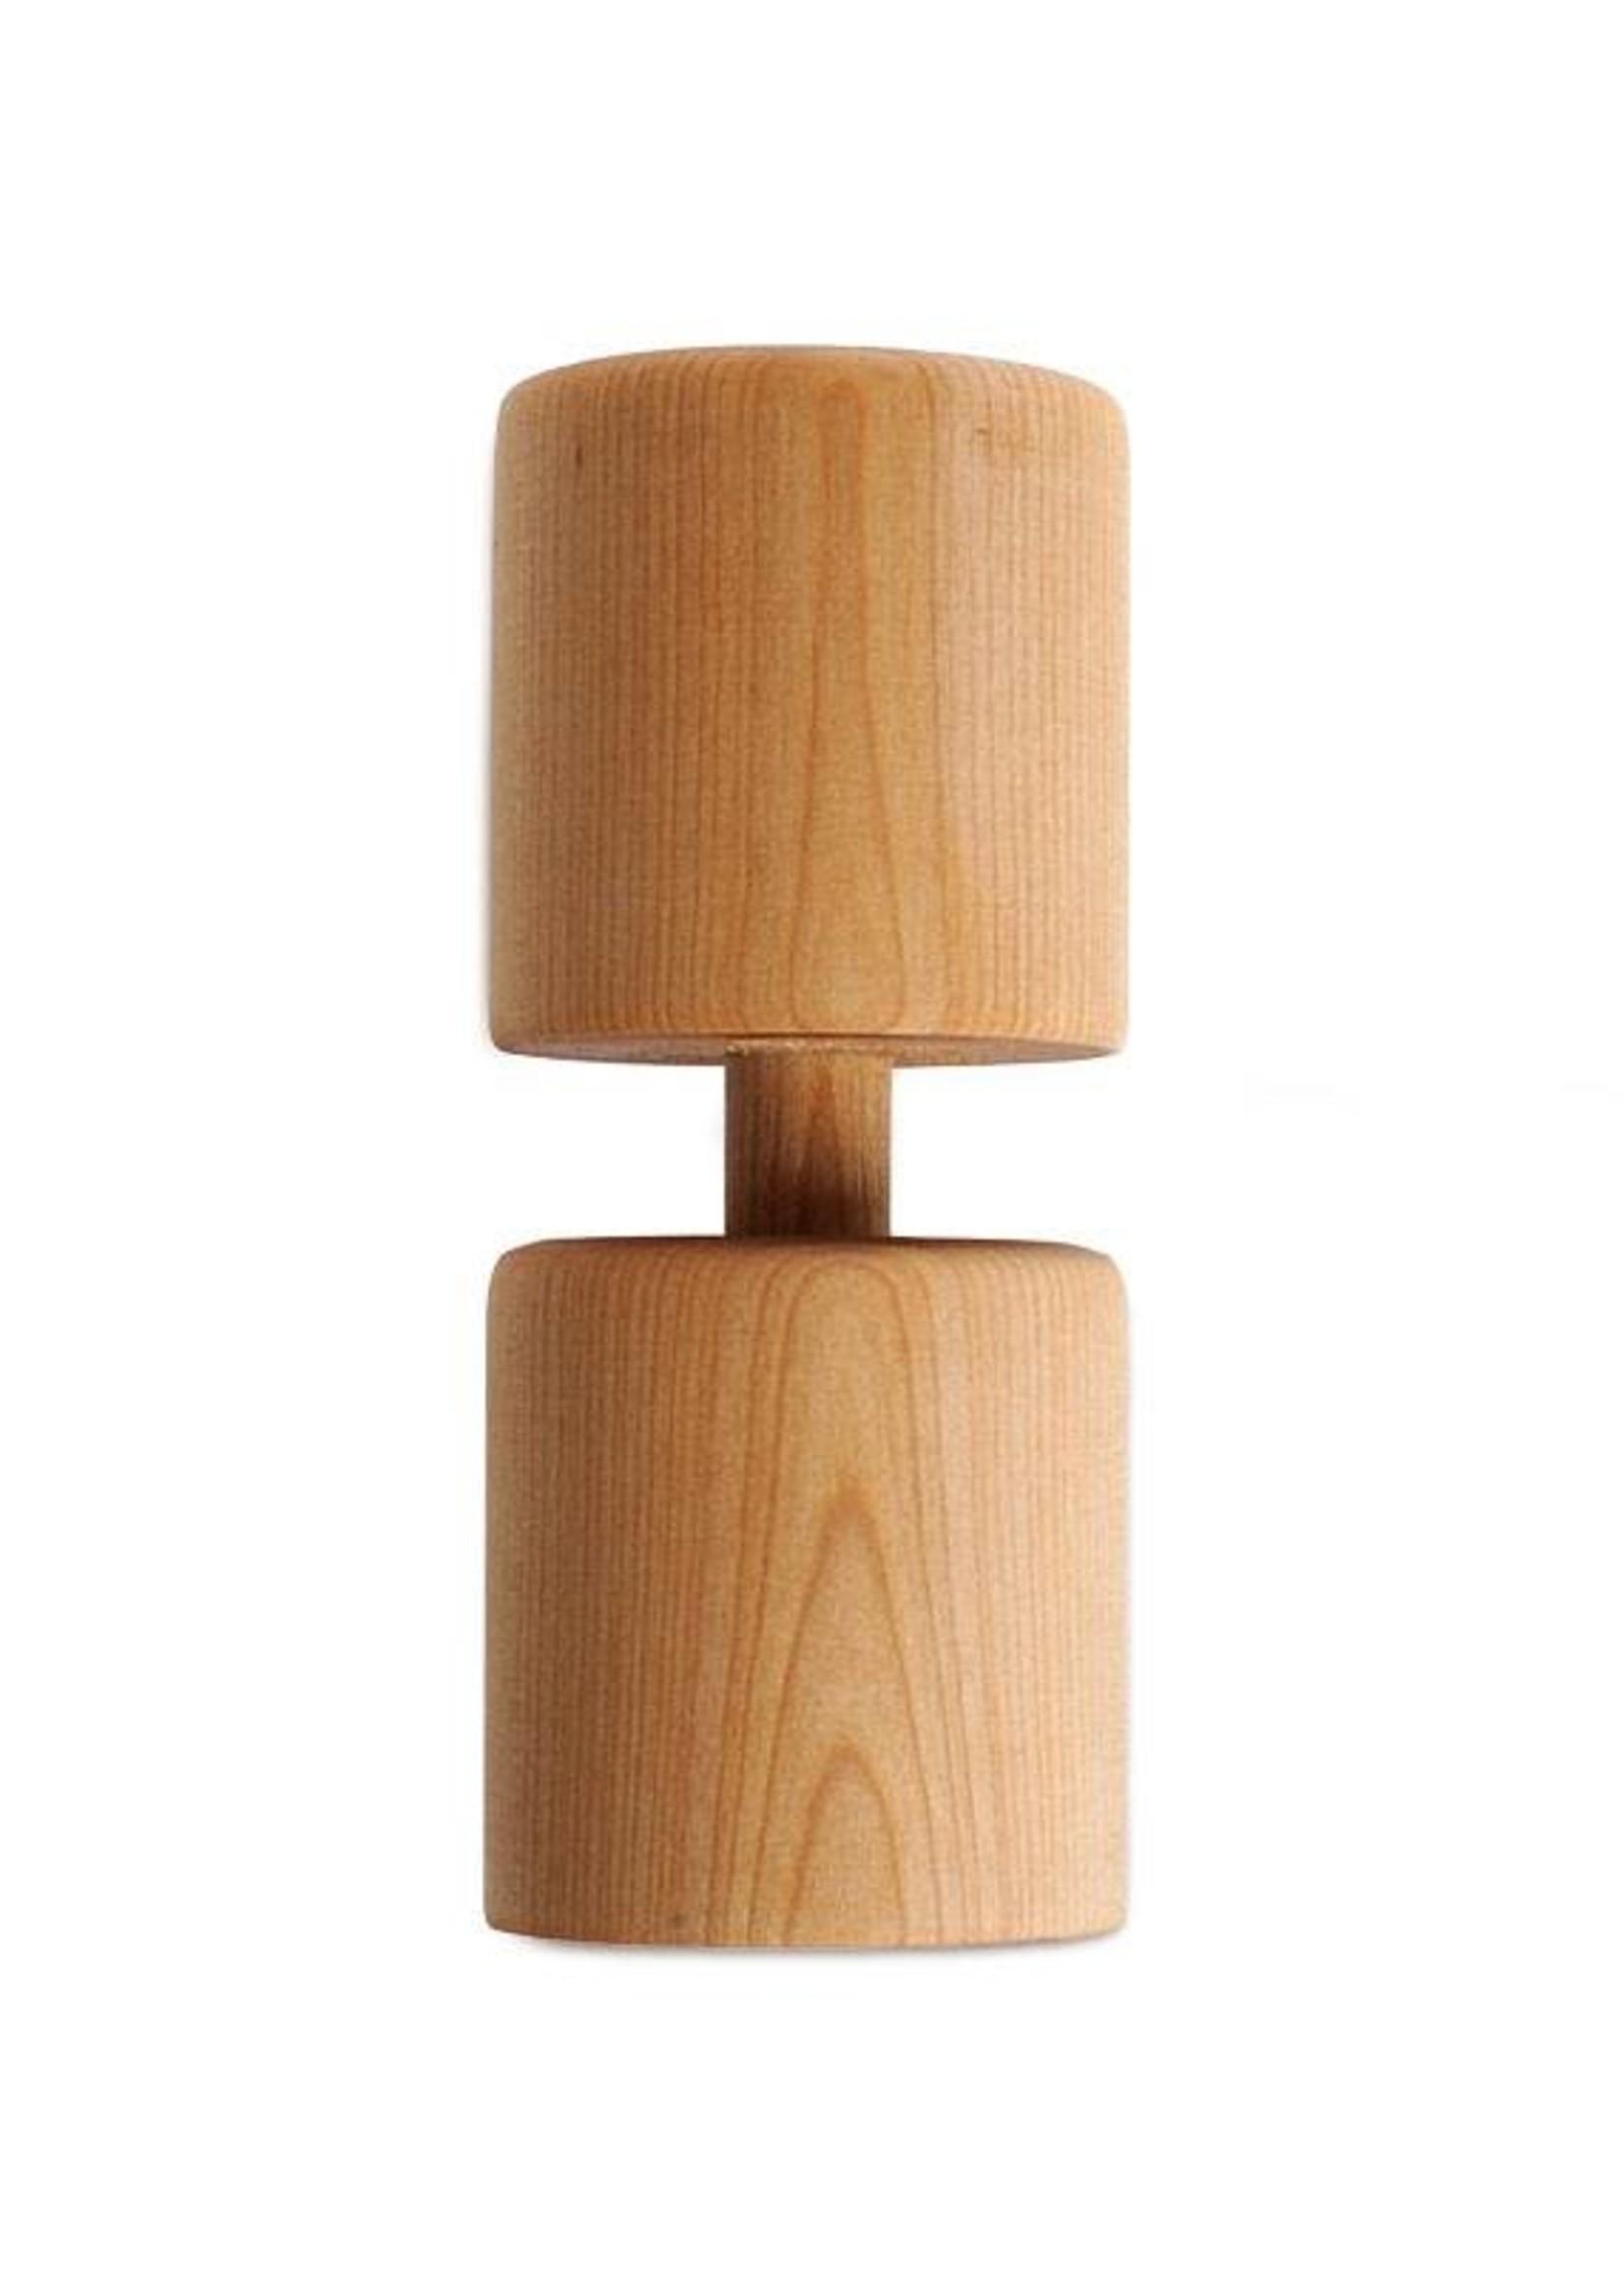 Vew-Do Vew-Do Mini 101 Board Rock Ersatzrolle